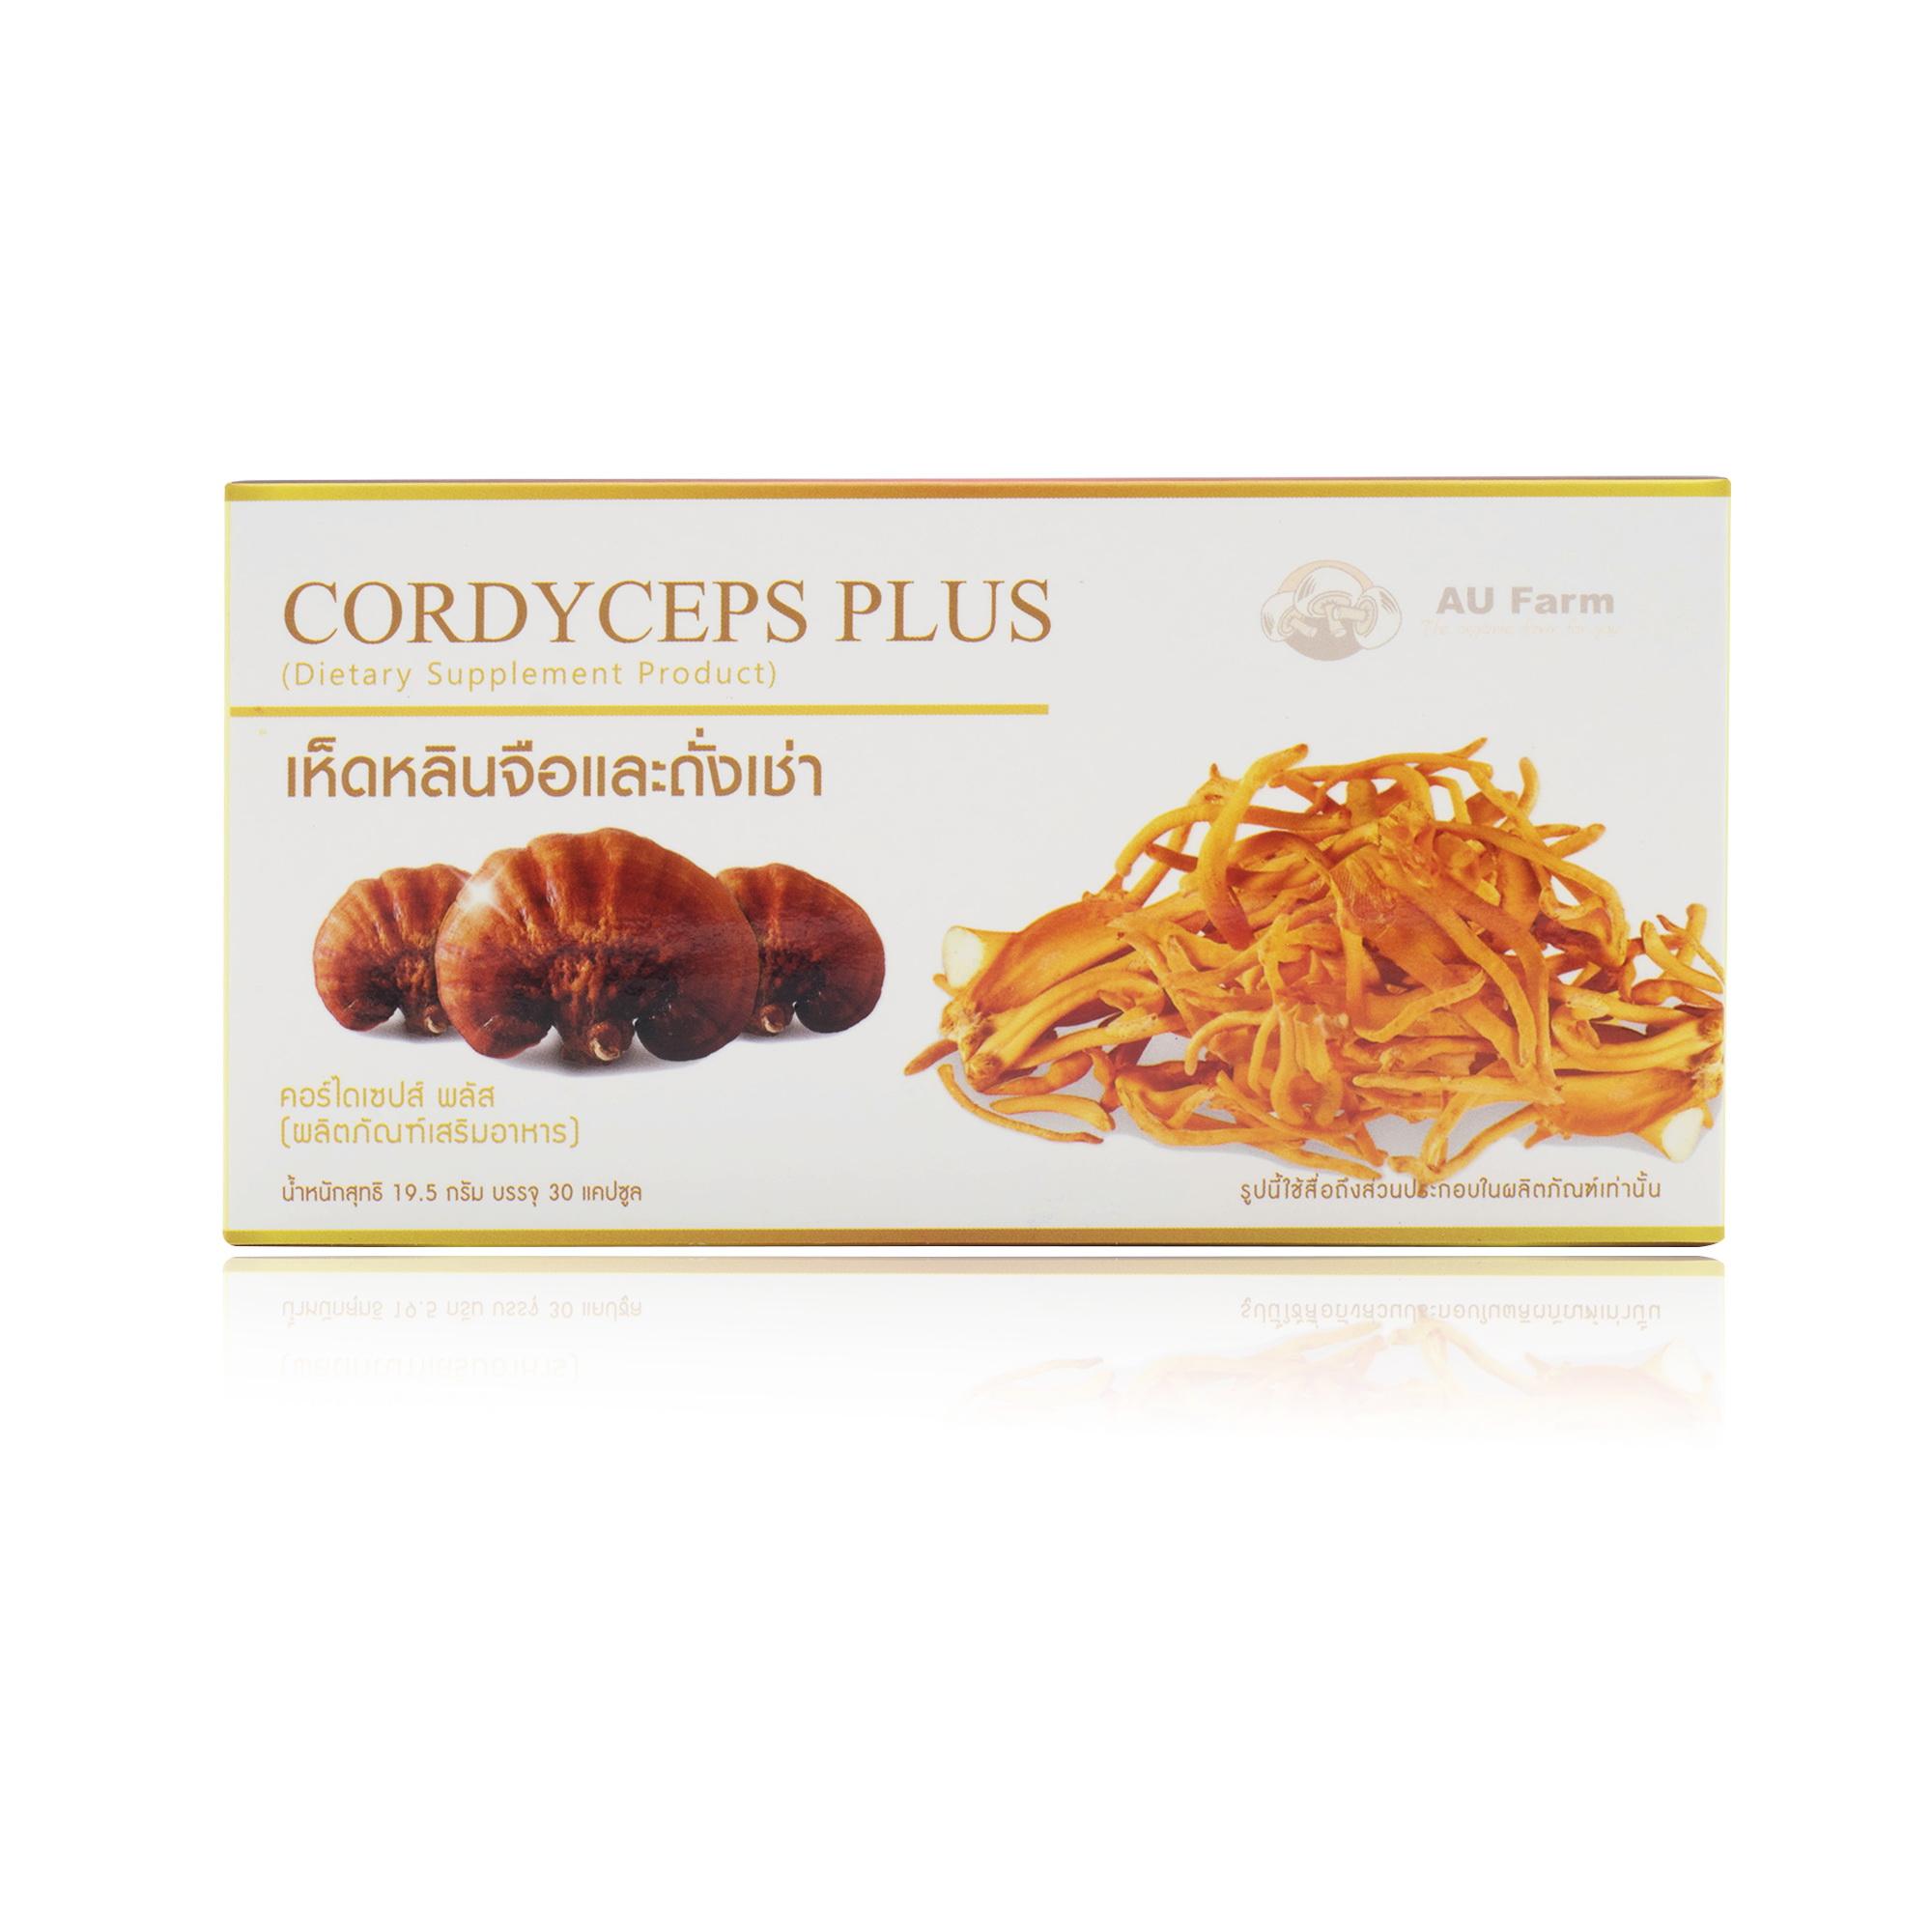 Cordyceps Plus เห็ดหลินจือแดงผสมถั่งเช่าสีทอง